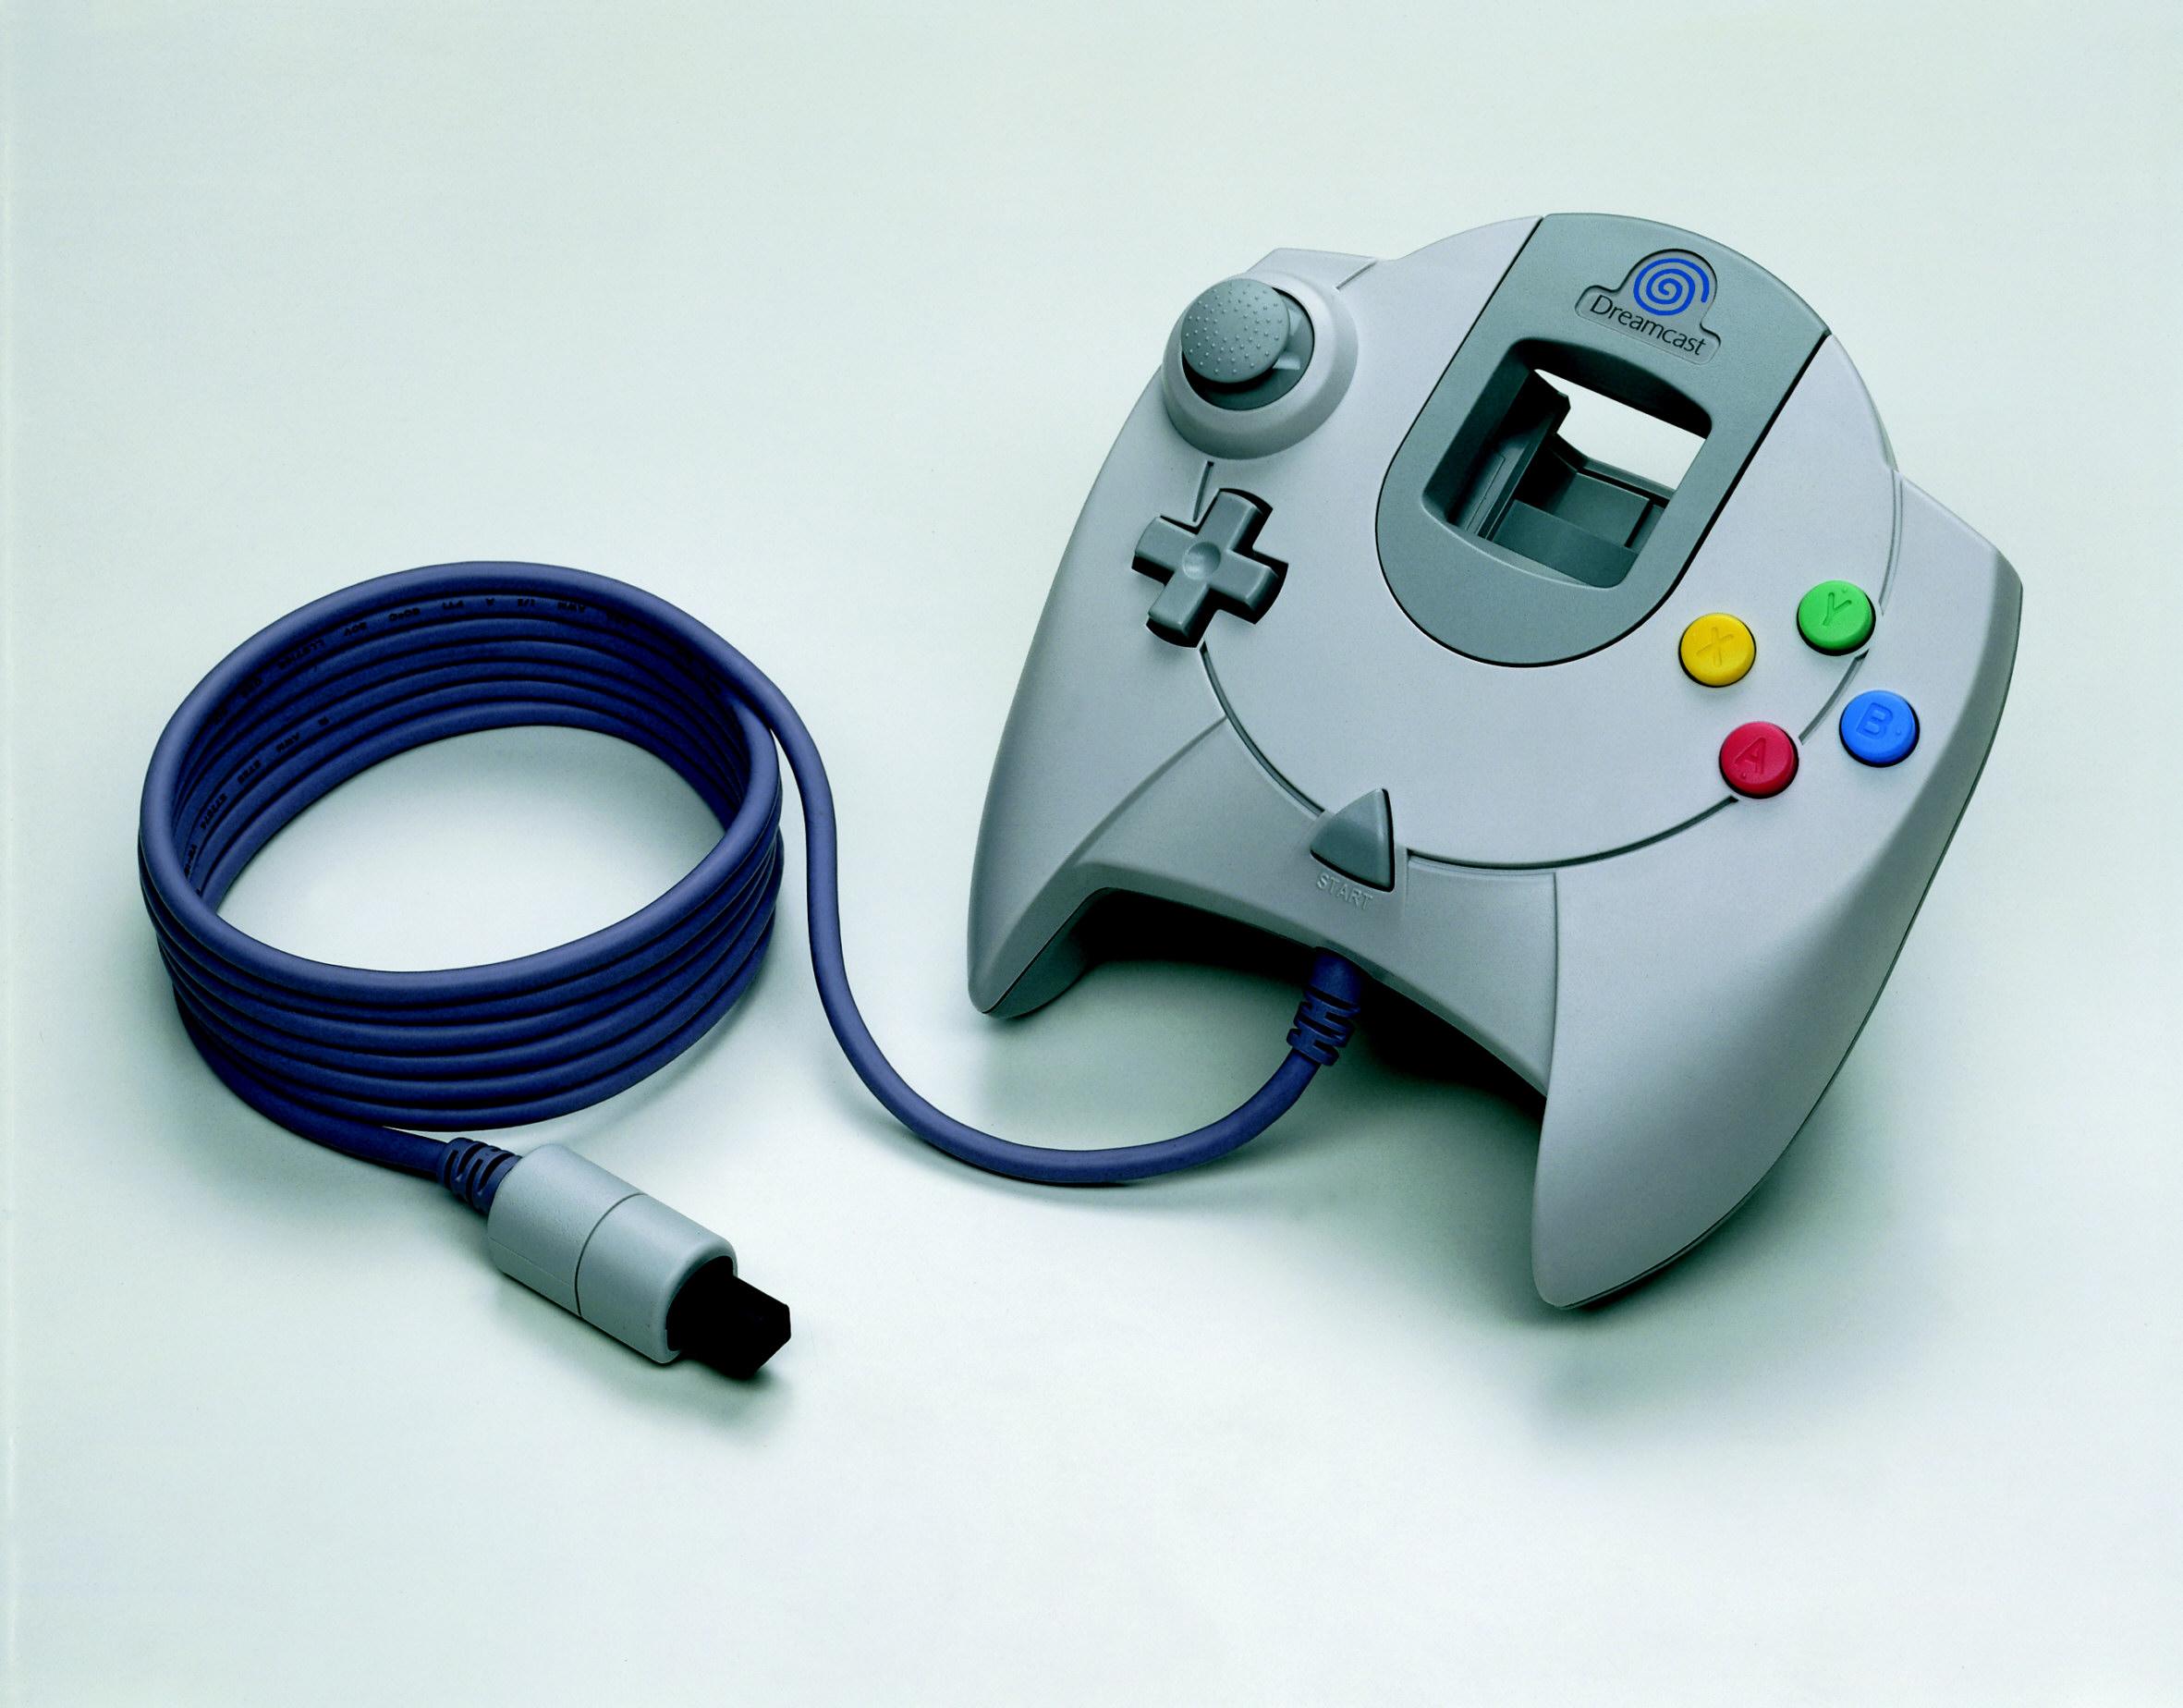 Dreamcast Controller Usb Wiring Diagram - Schematic Diagrams